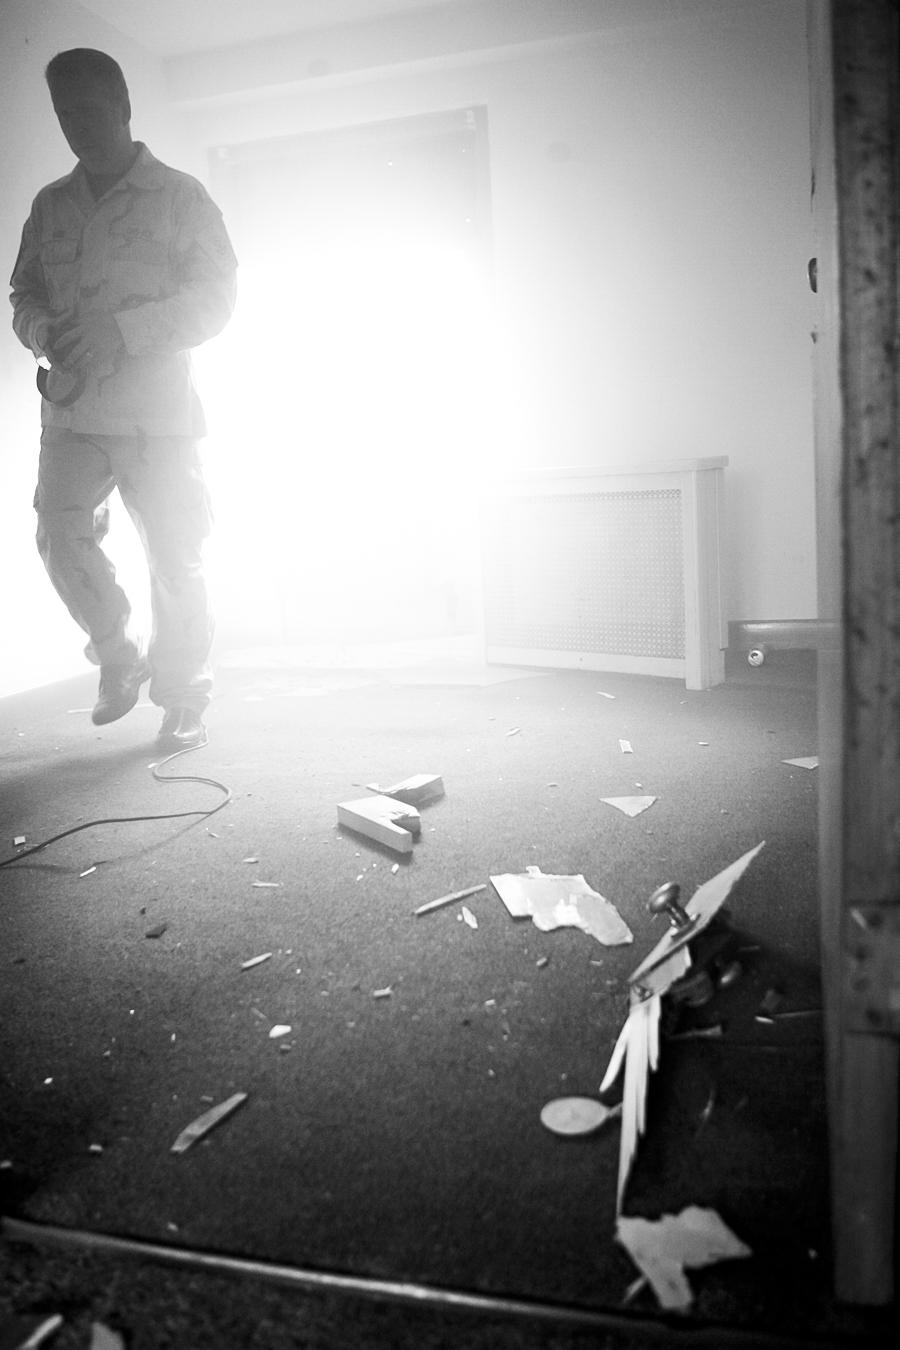 photojournalist chicago sun times homeland security drills lagrange ruthie hauge photography 05.jpg